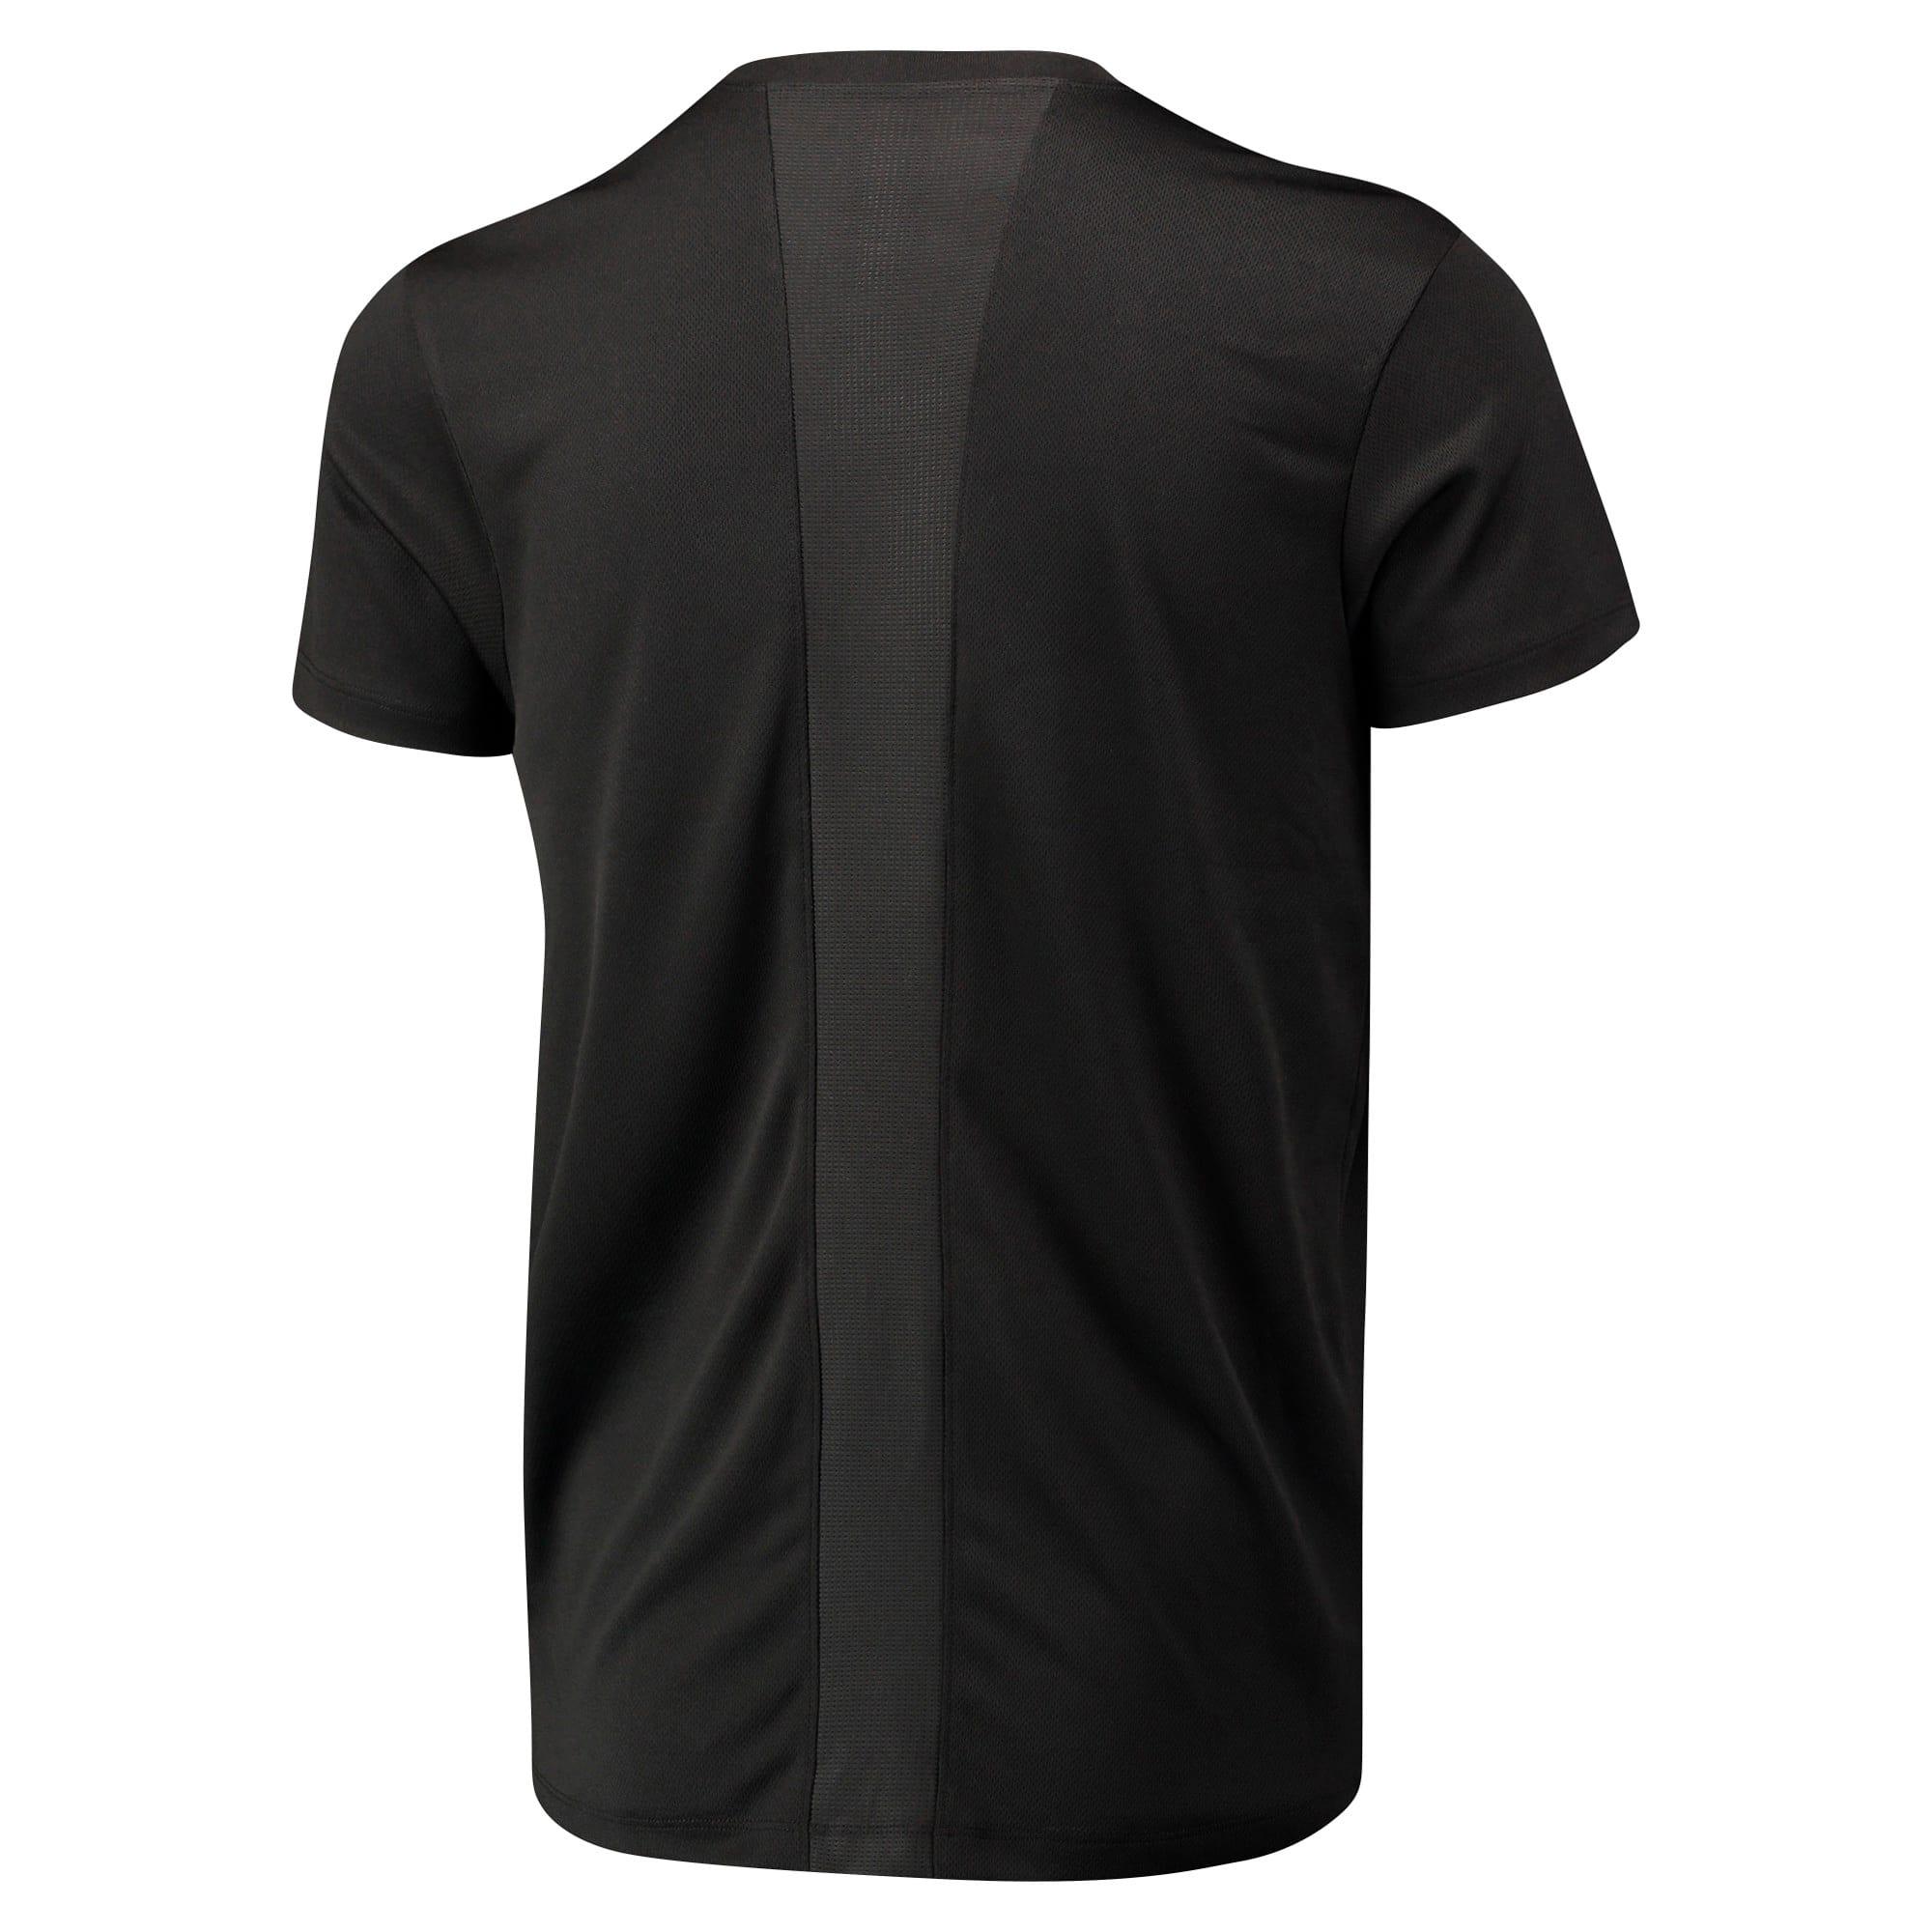 Thumbnail 2 of Active Men's Cree T-Shirt, black, medium